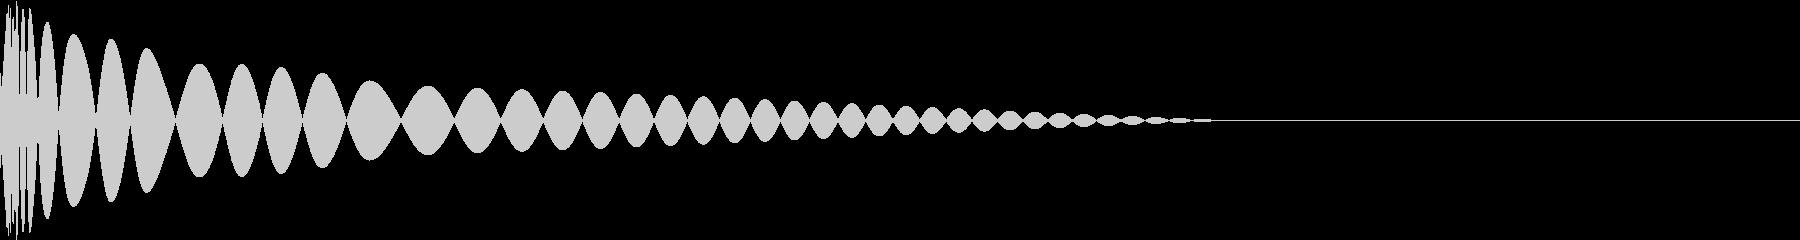 DTM Kick 14 オリジナル音源の未再生の波形